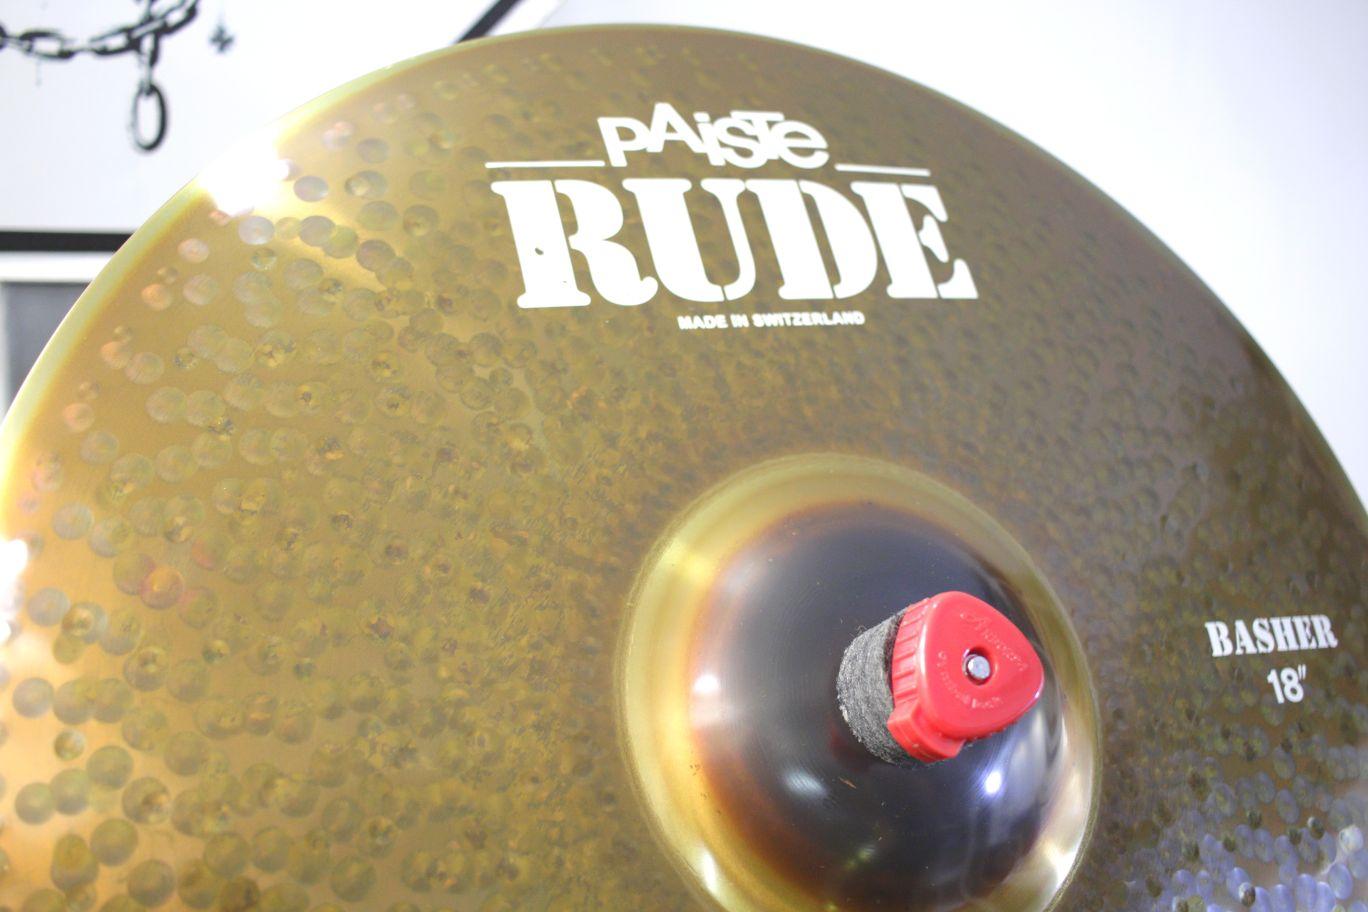 BASHER 18 RUDE PAISTE